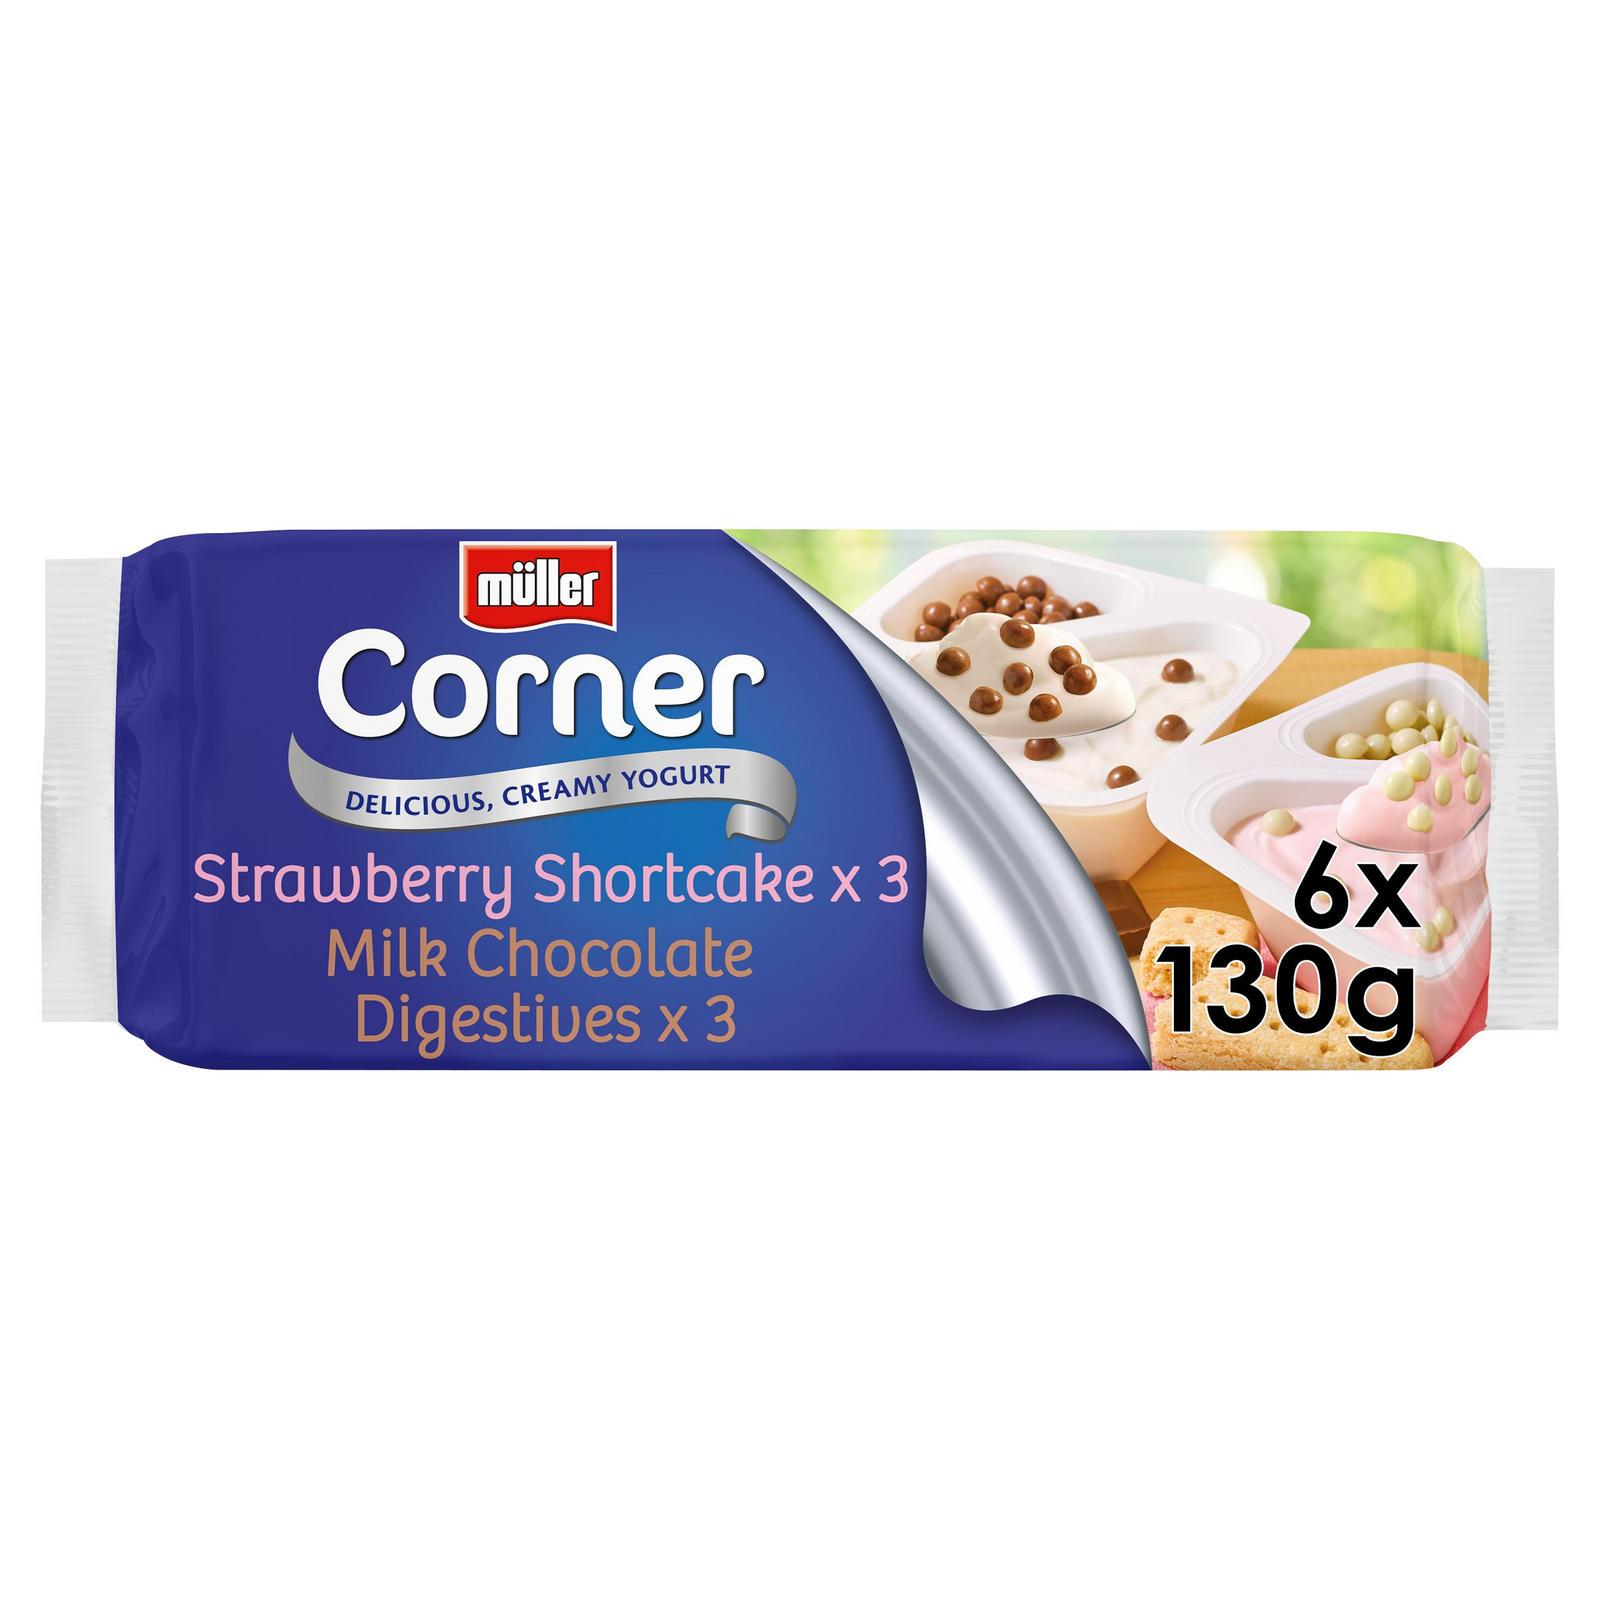 Muller Corner Strawberry and Peach & Apricot Yogurts 6 x 143g - £2 @ Iceland